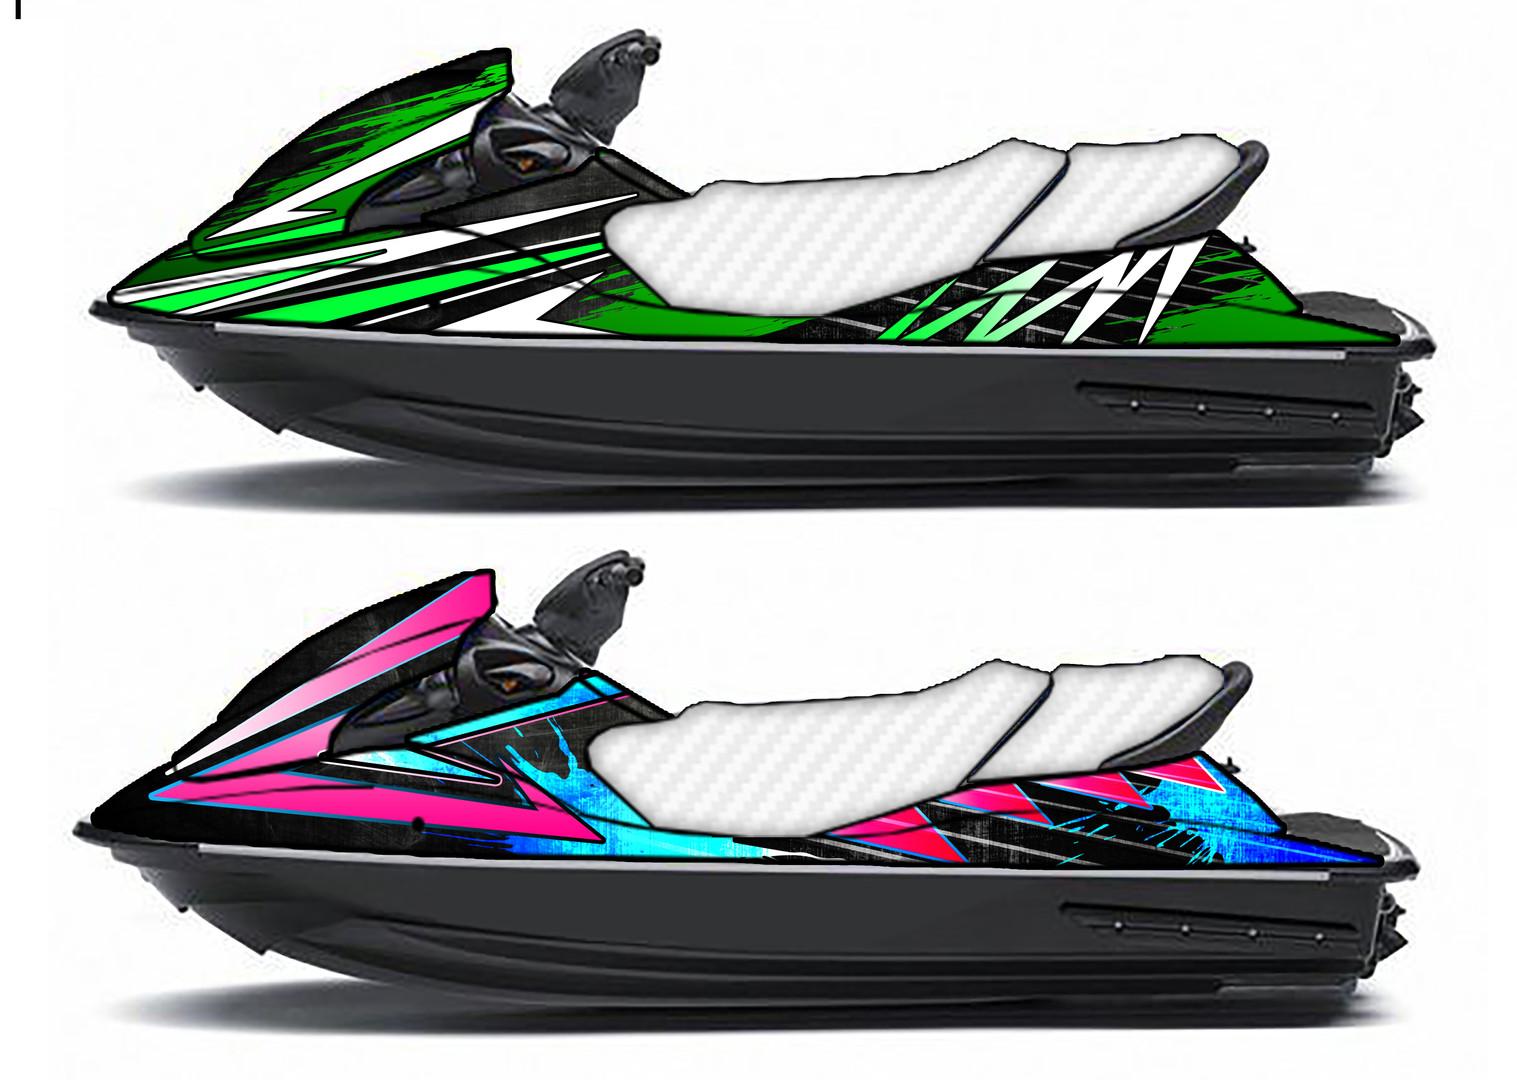 Jet Ski wrap designs